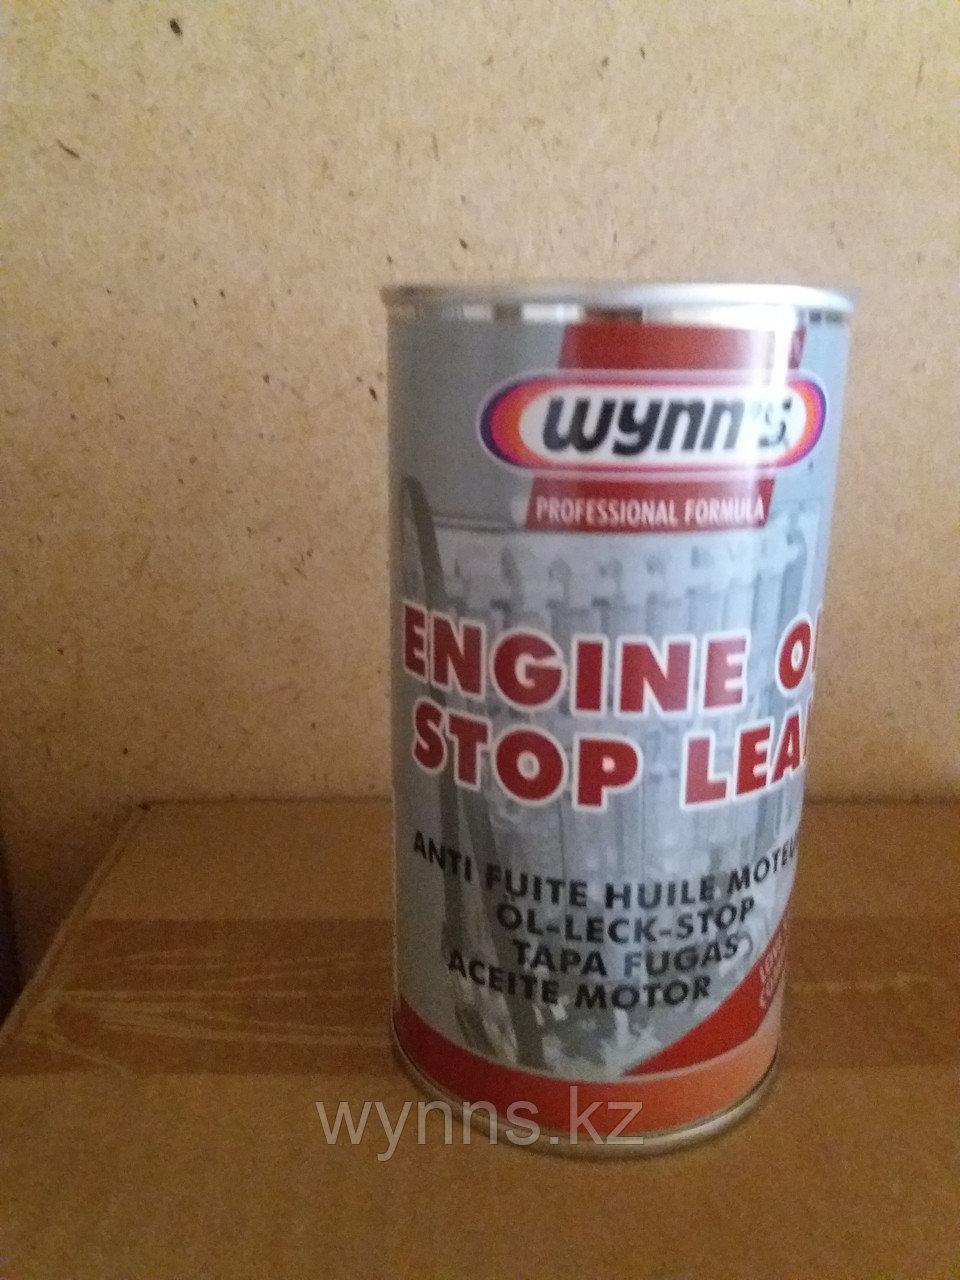 Присадка для предотвращения течи масла в двигателе Engine Oil Stop-Leak